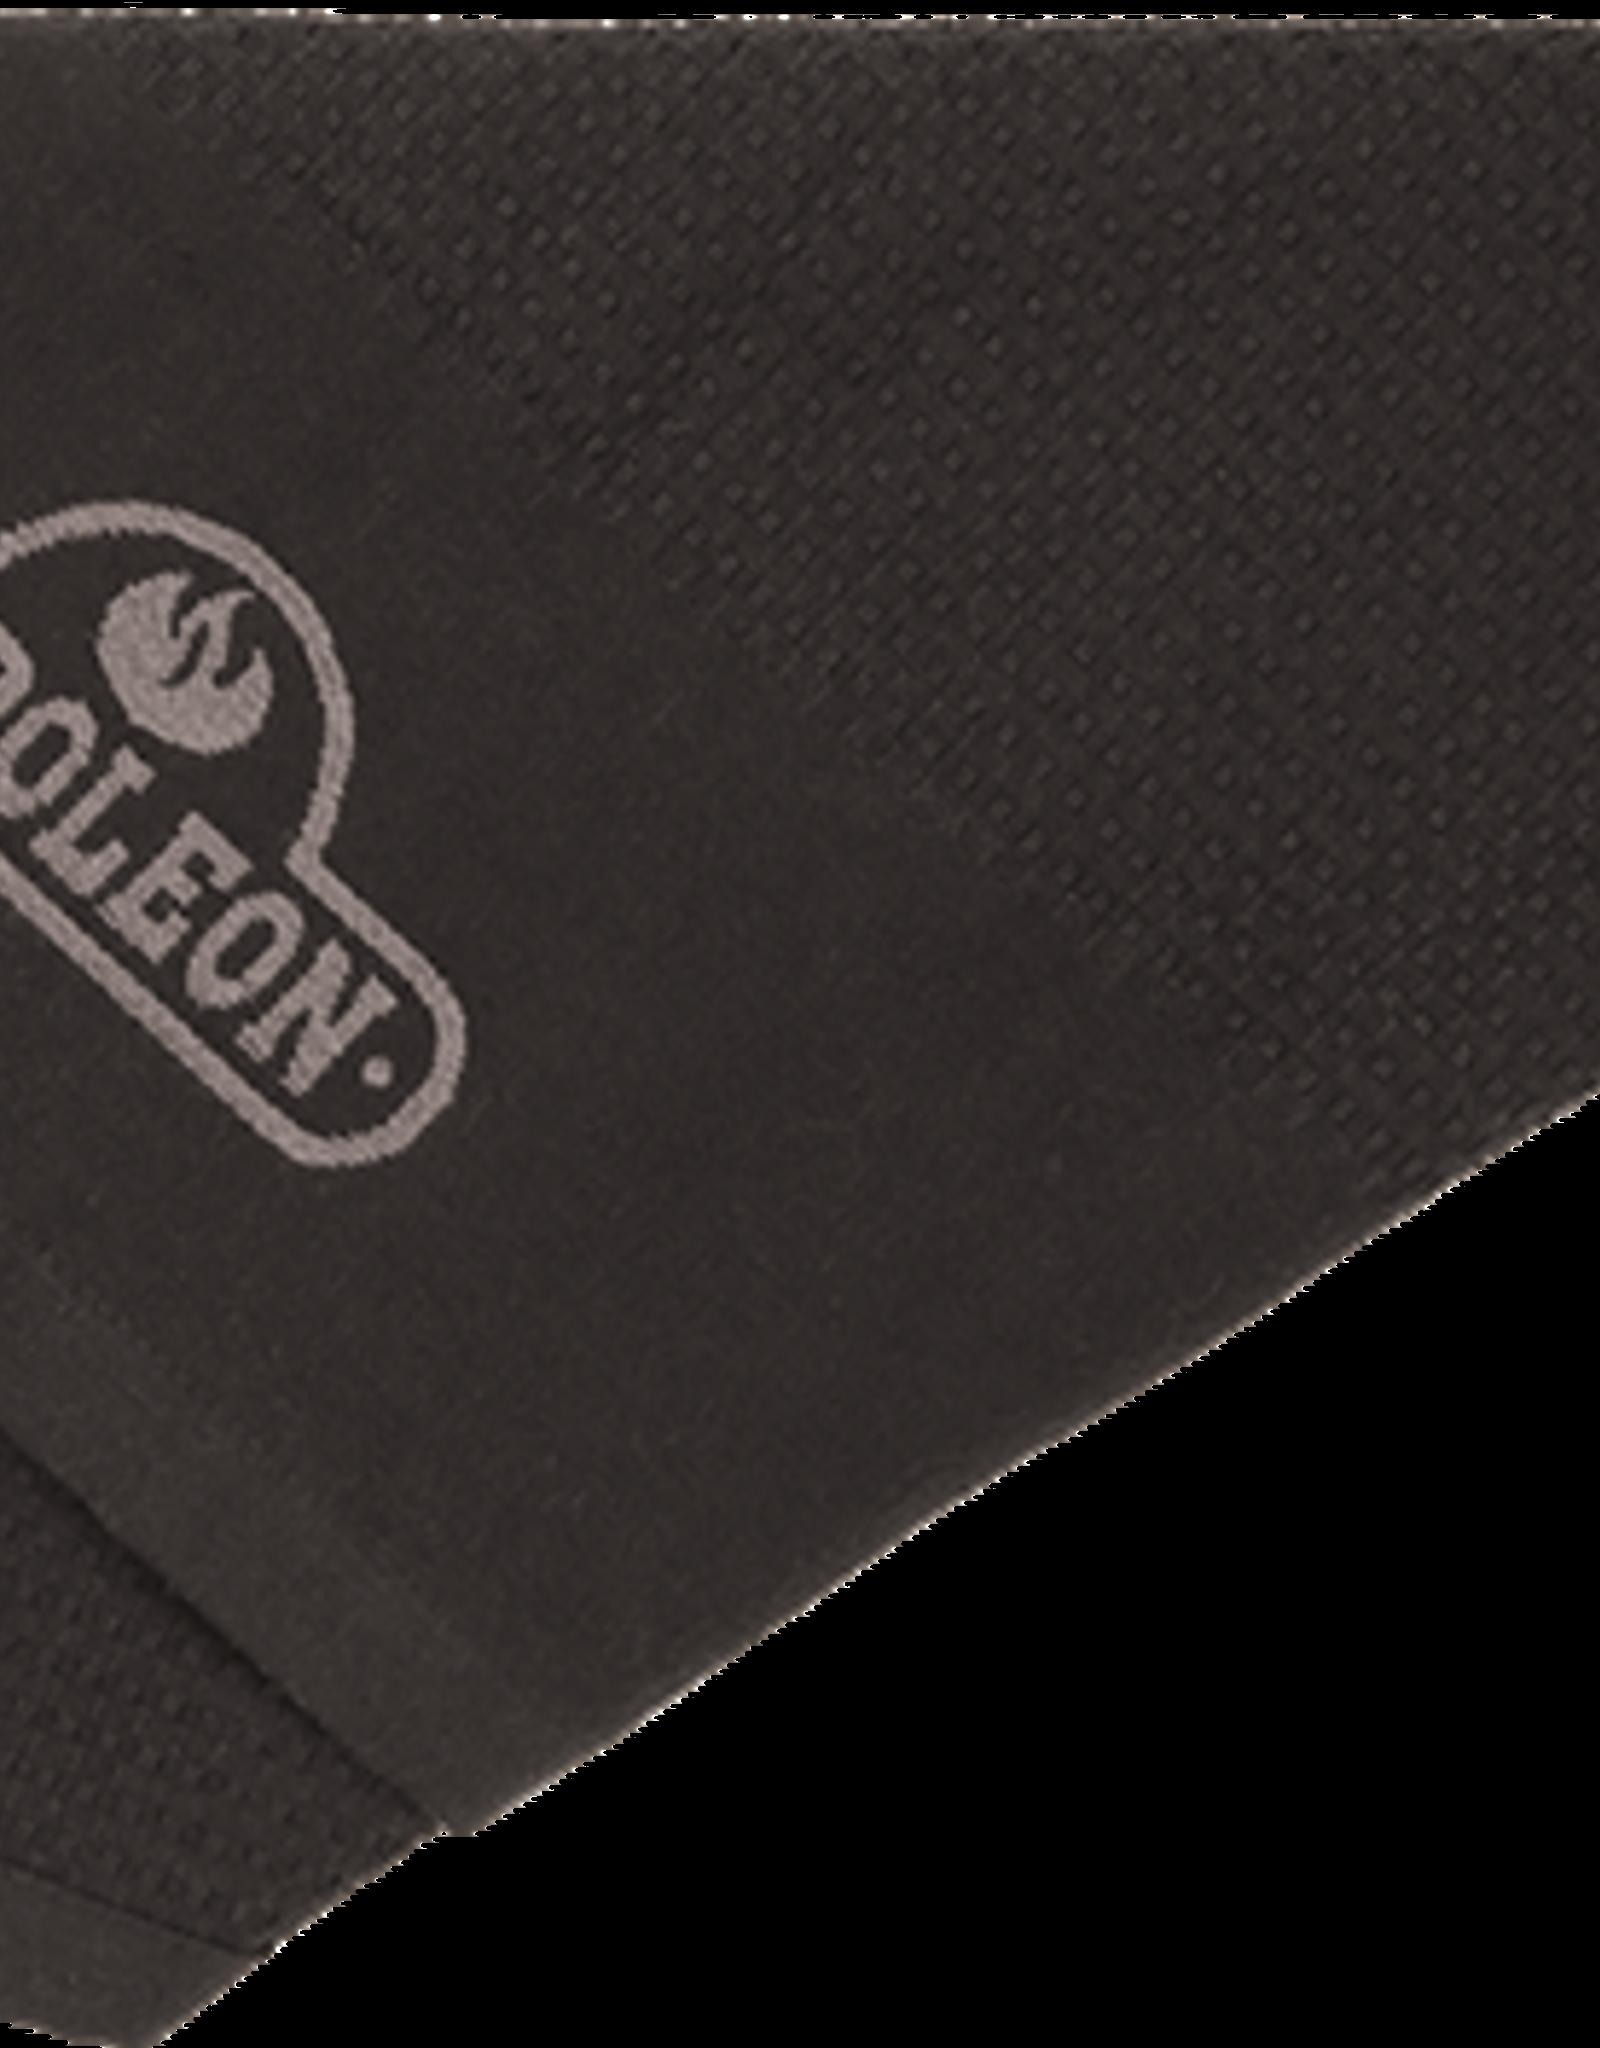 Napoleon Grill Towel - 62150